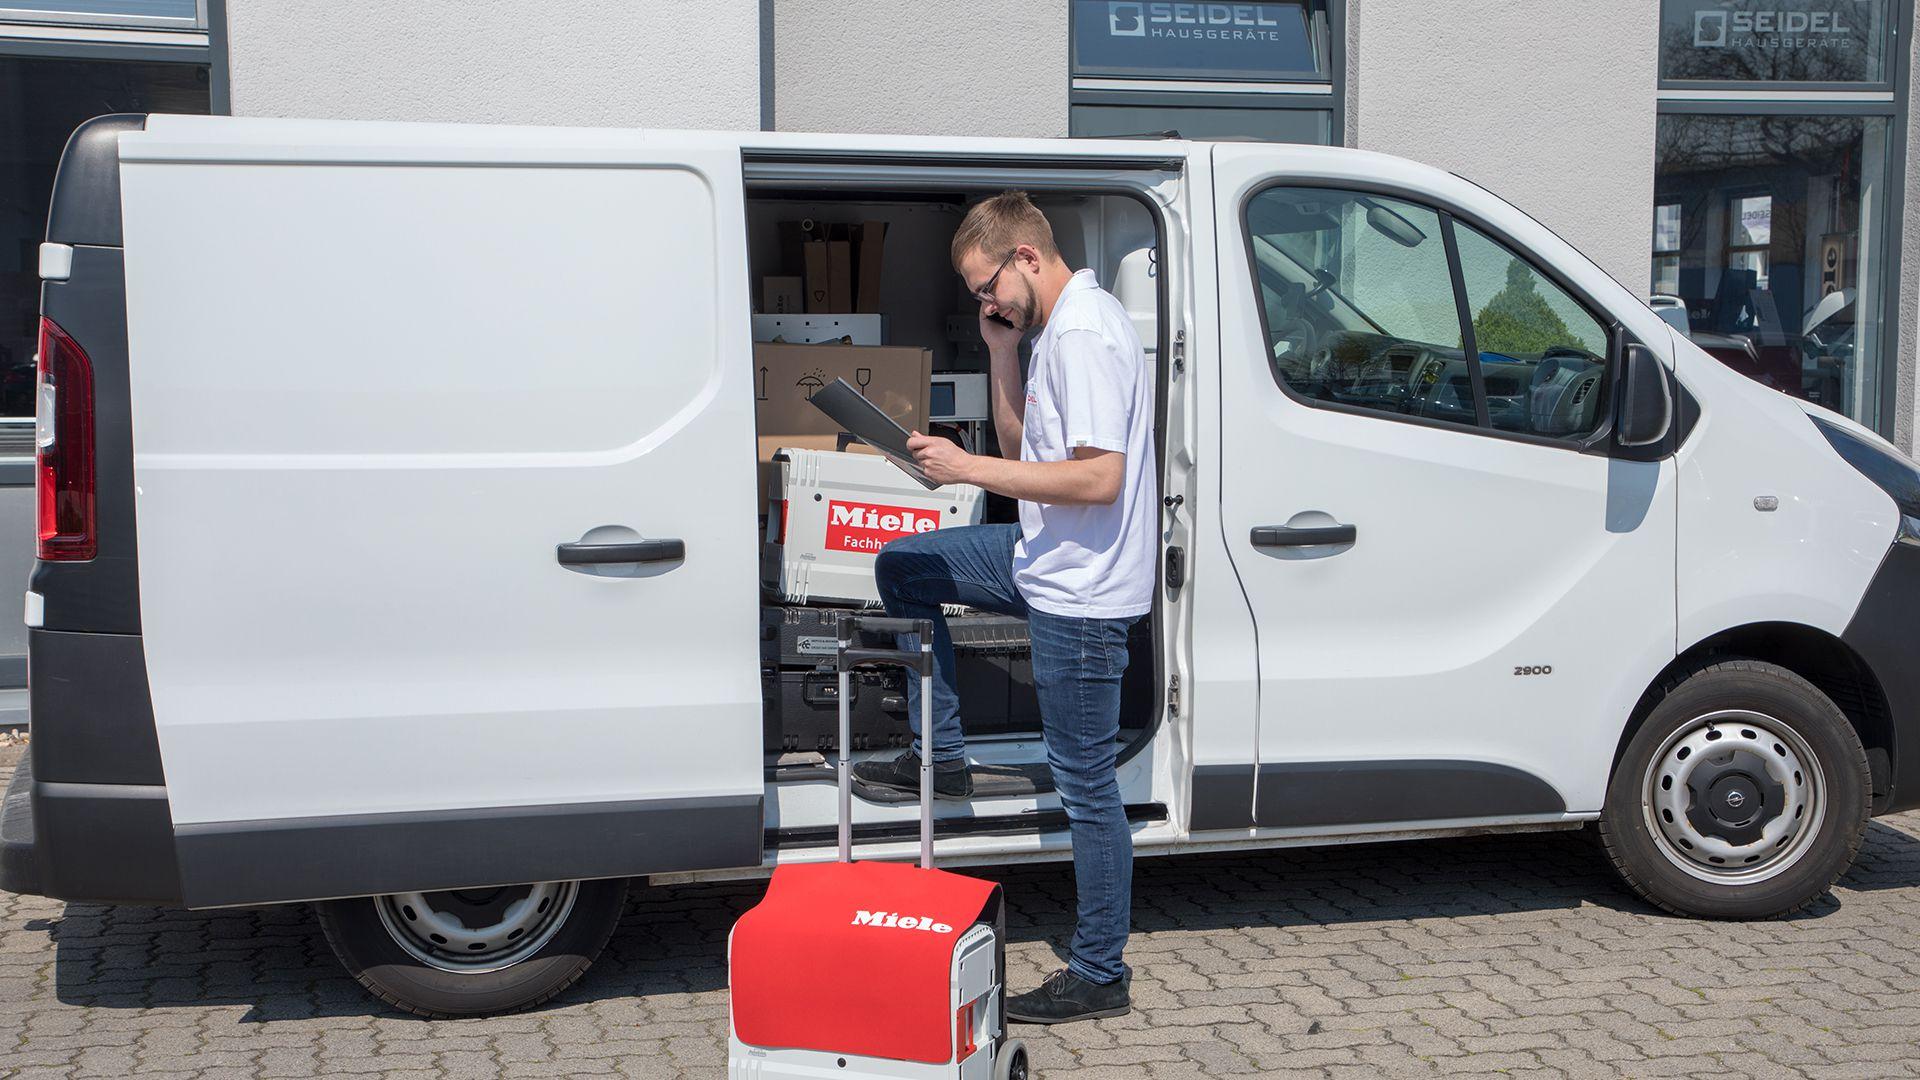 Seidel-Miele-Professional-Waeschereitechnik-Service-Reparatur-Wartung